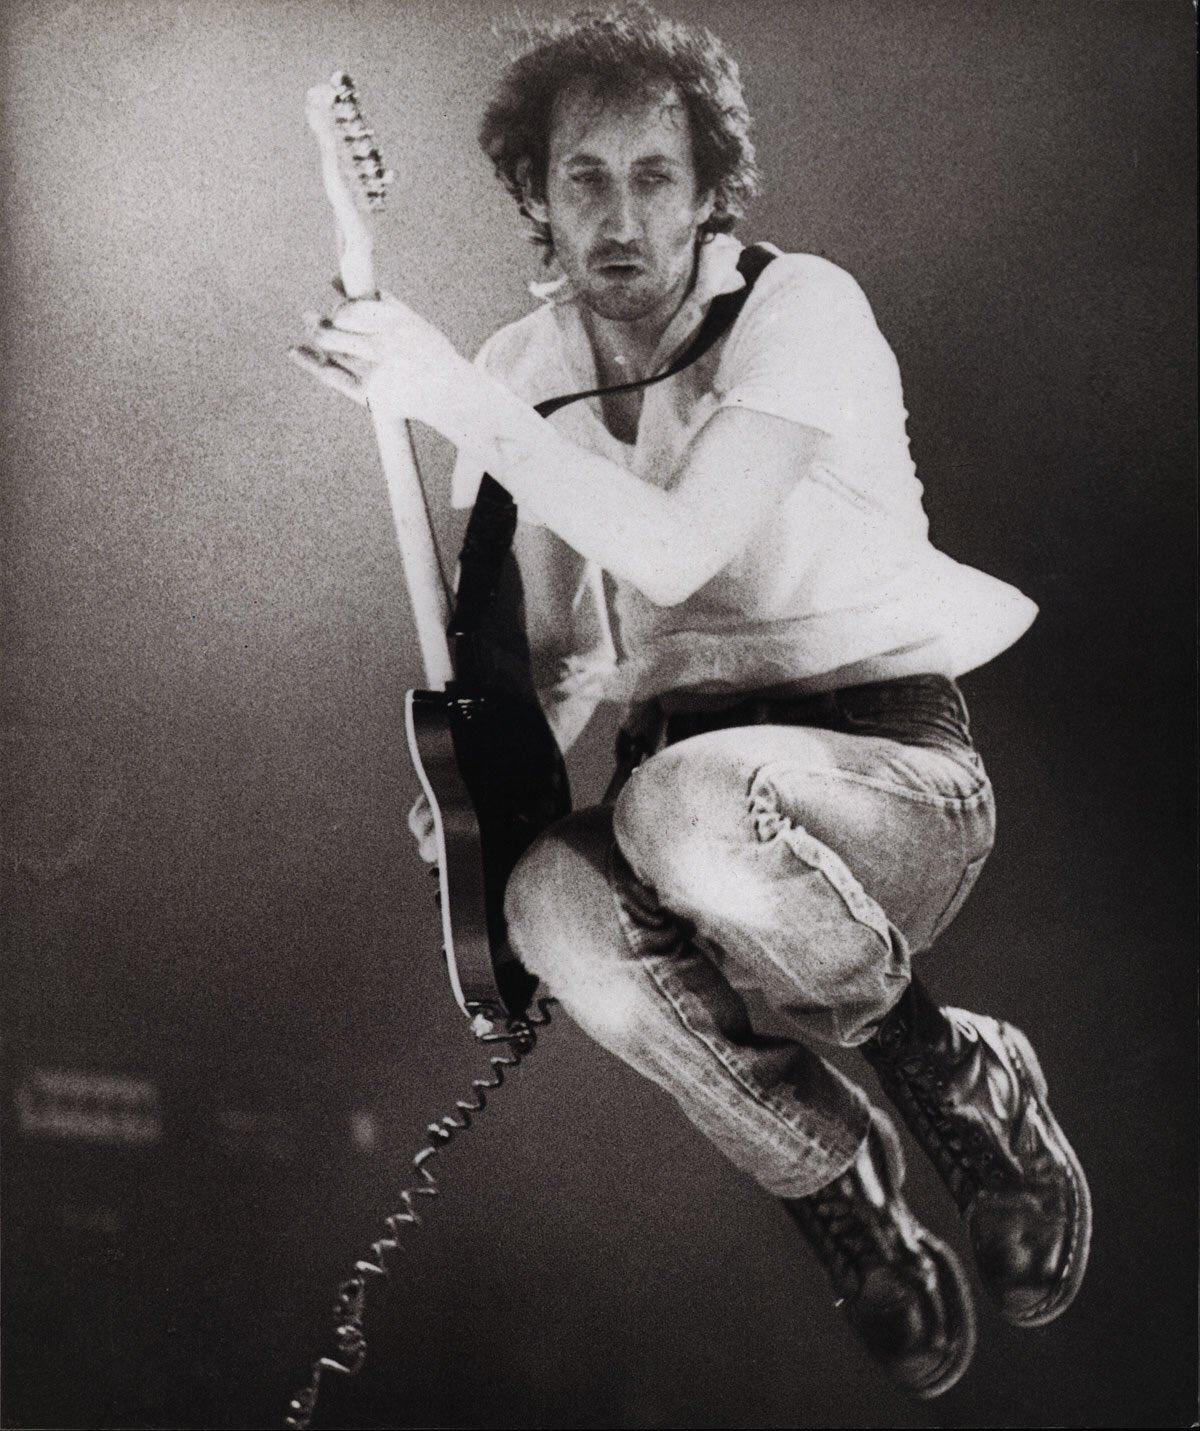 Happy Birthday to legendary guitarist, Pete Townshend of